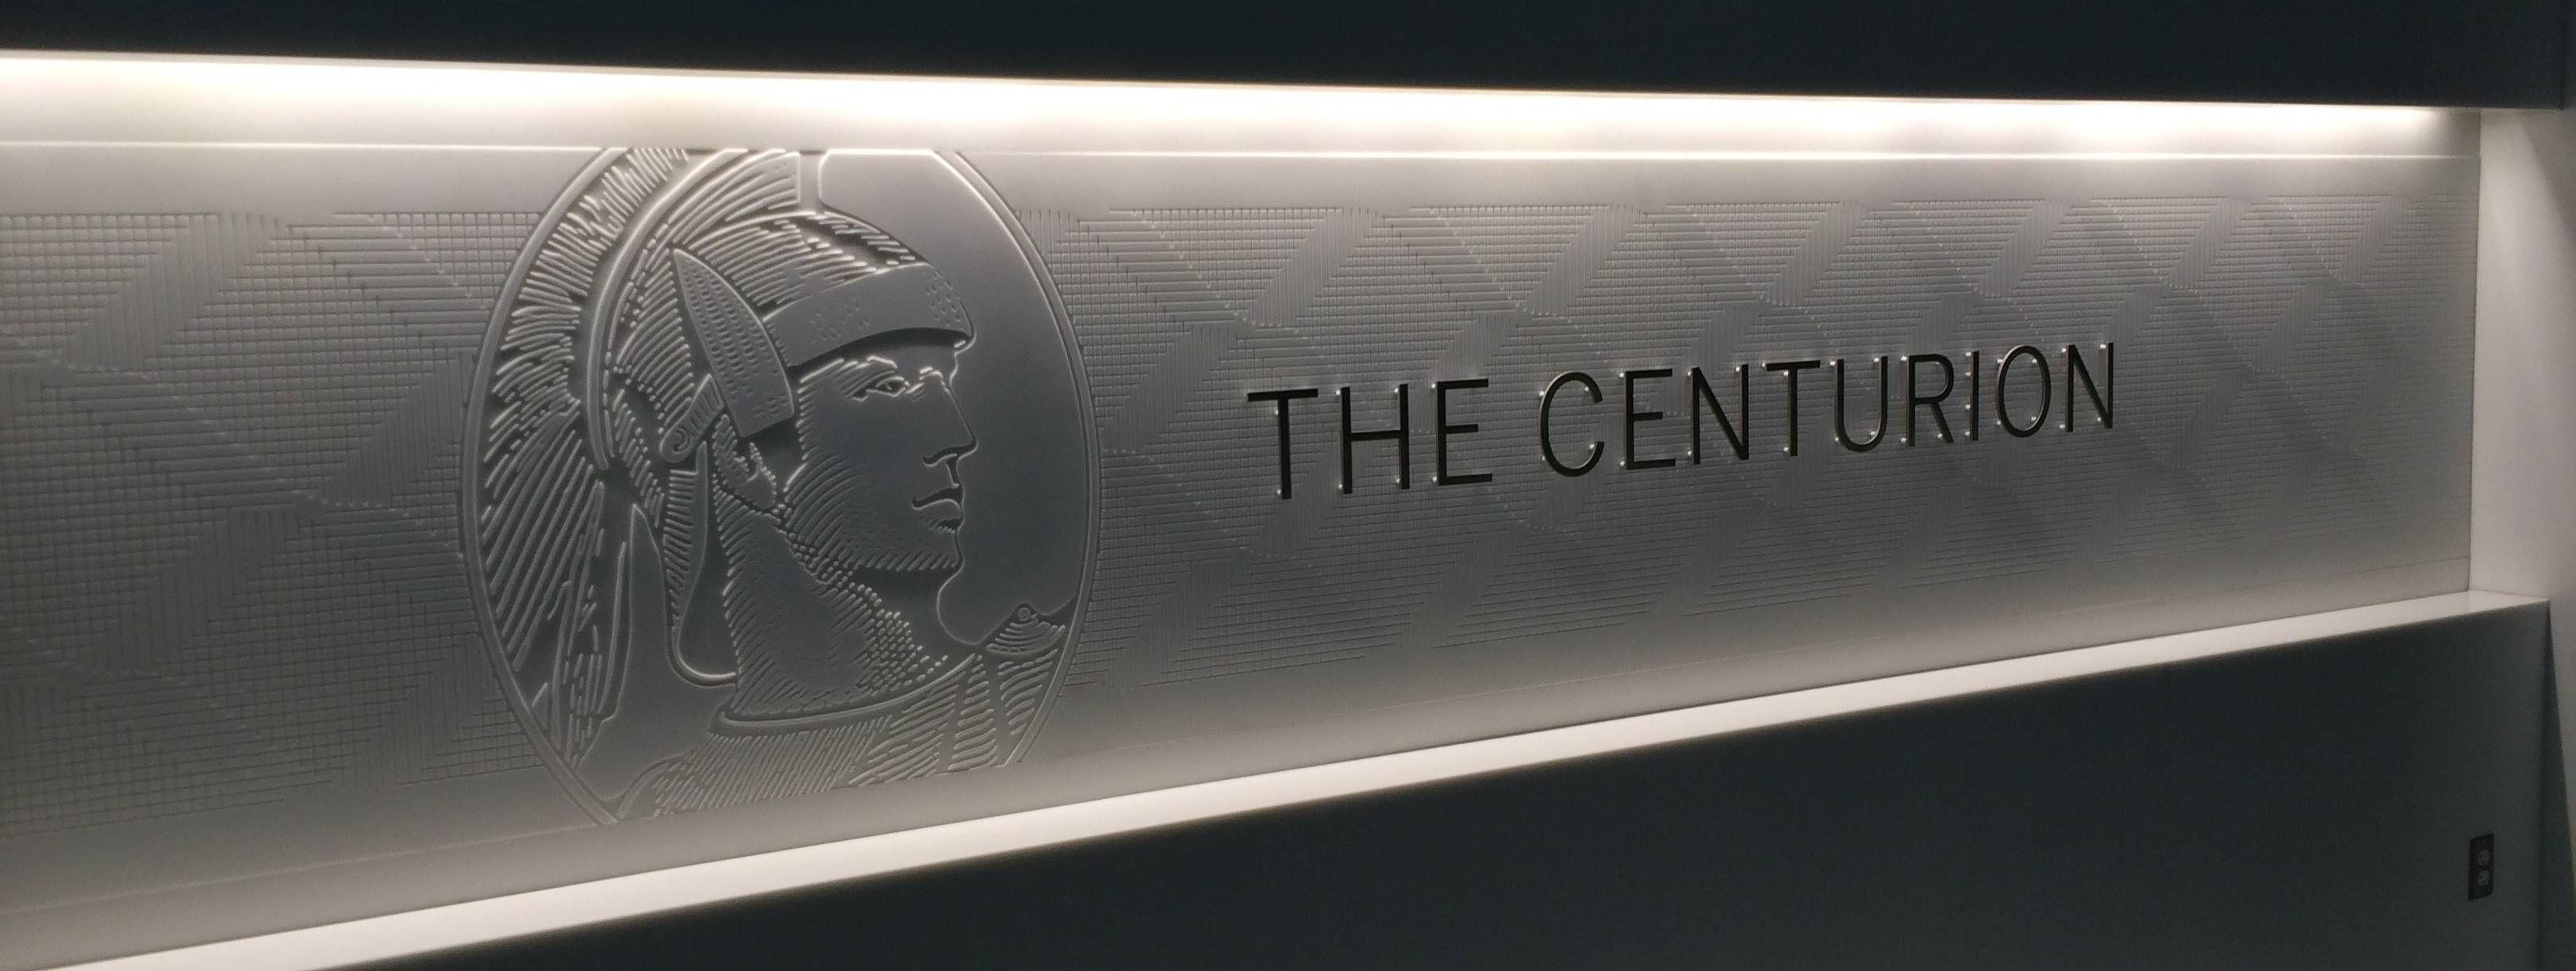 Sala VIP Centurion Lounge by American Express no Aeroporto de Dallas (DFW)